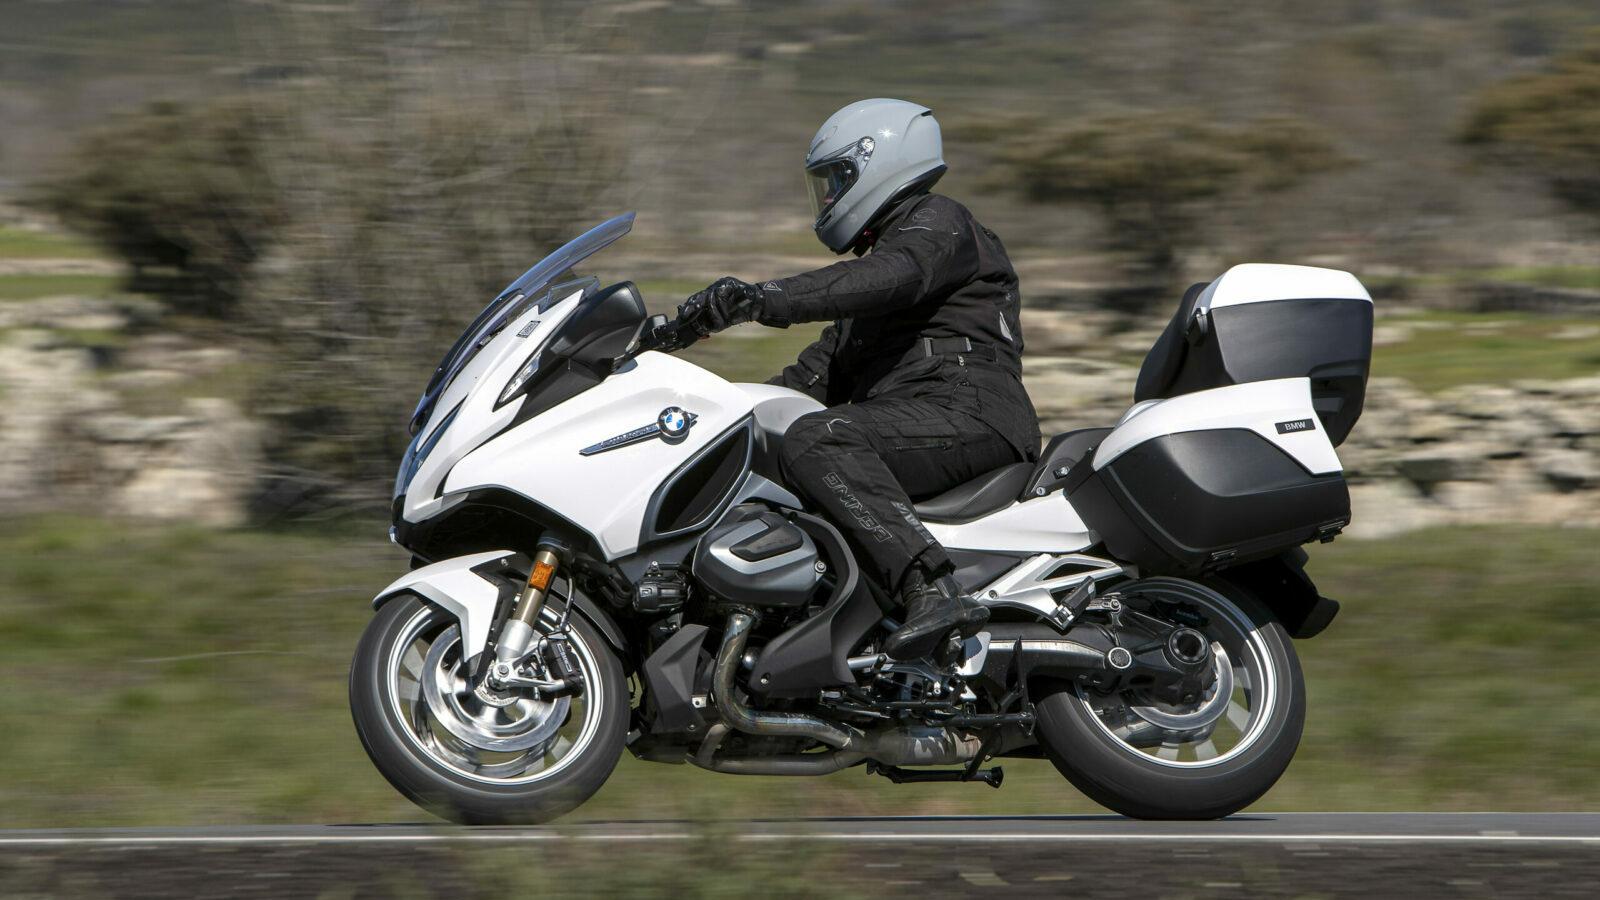 Fotos: Prueba BMW R 1250 RT 2021